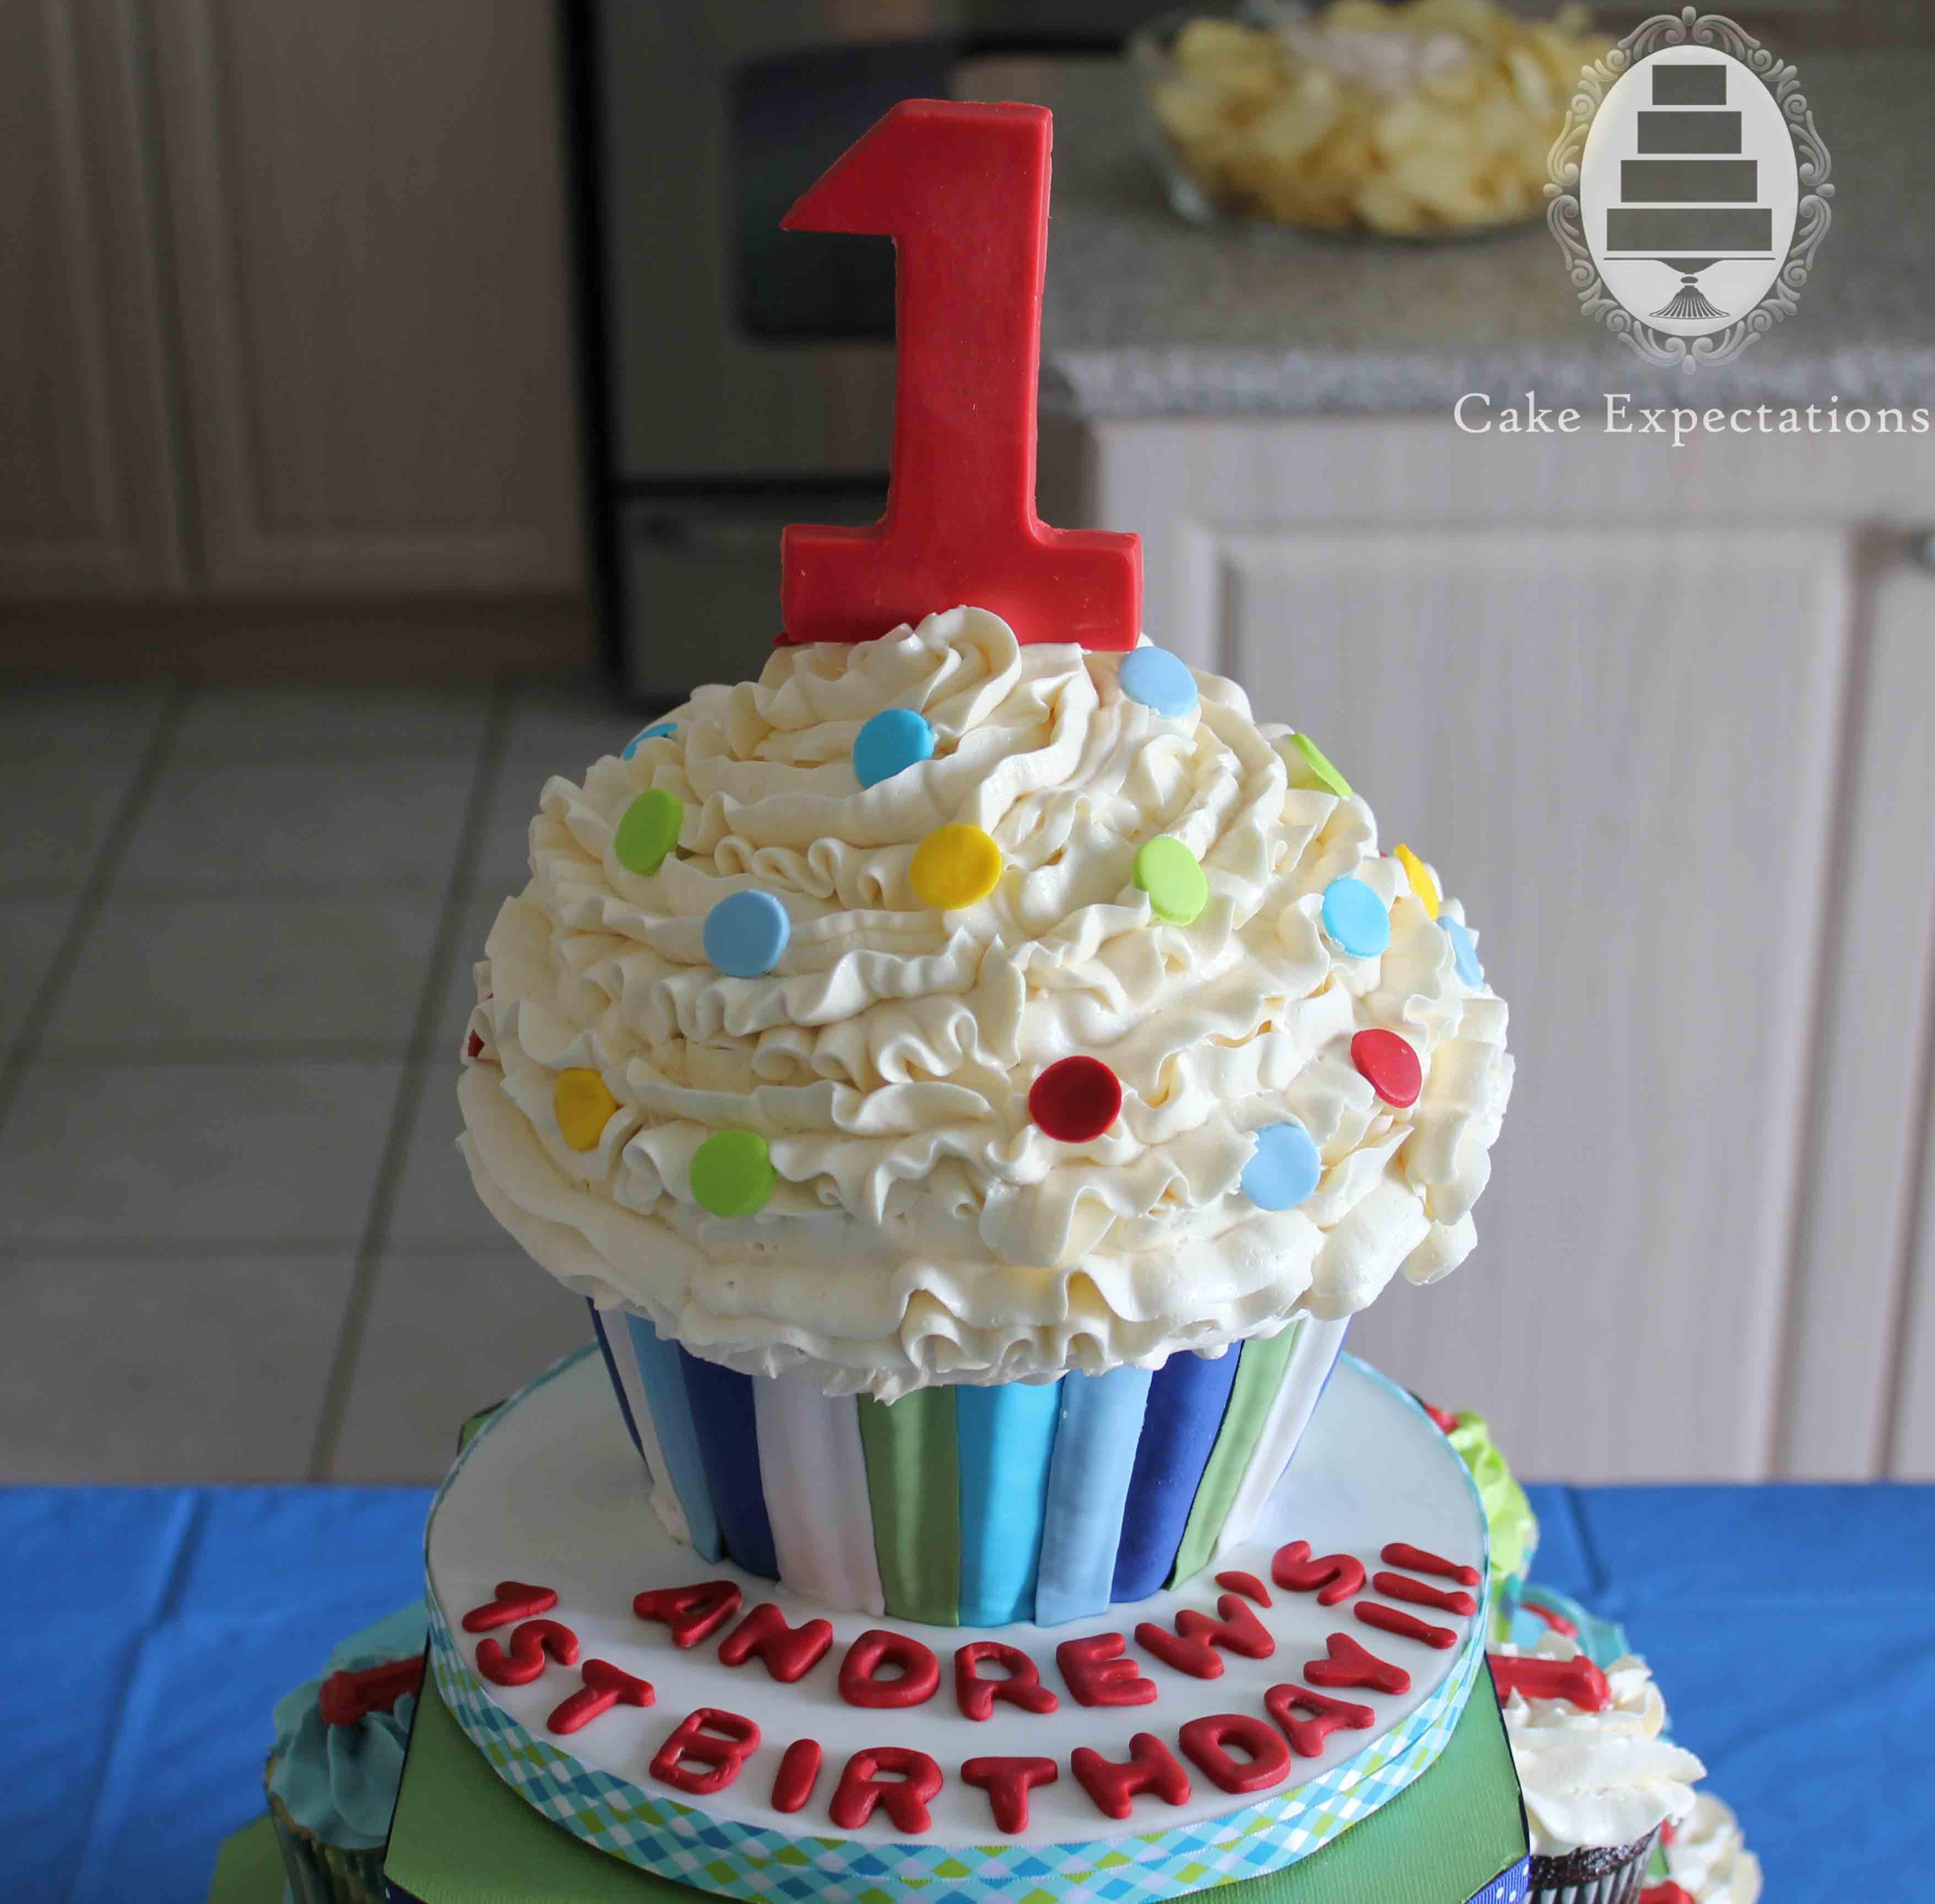 1St Birthday Cake  Cake Expectations – Children's Cakes